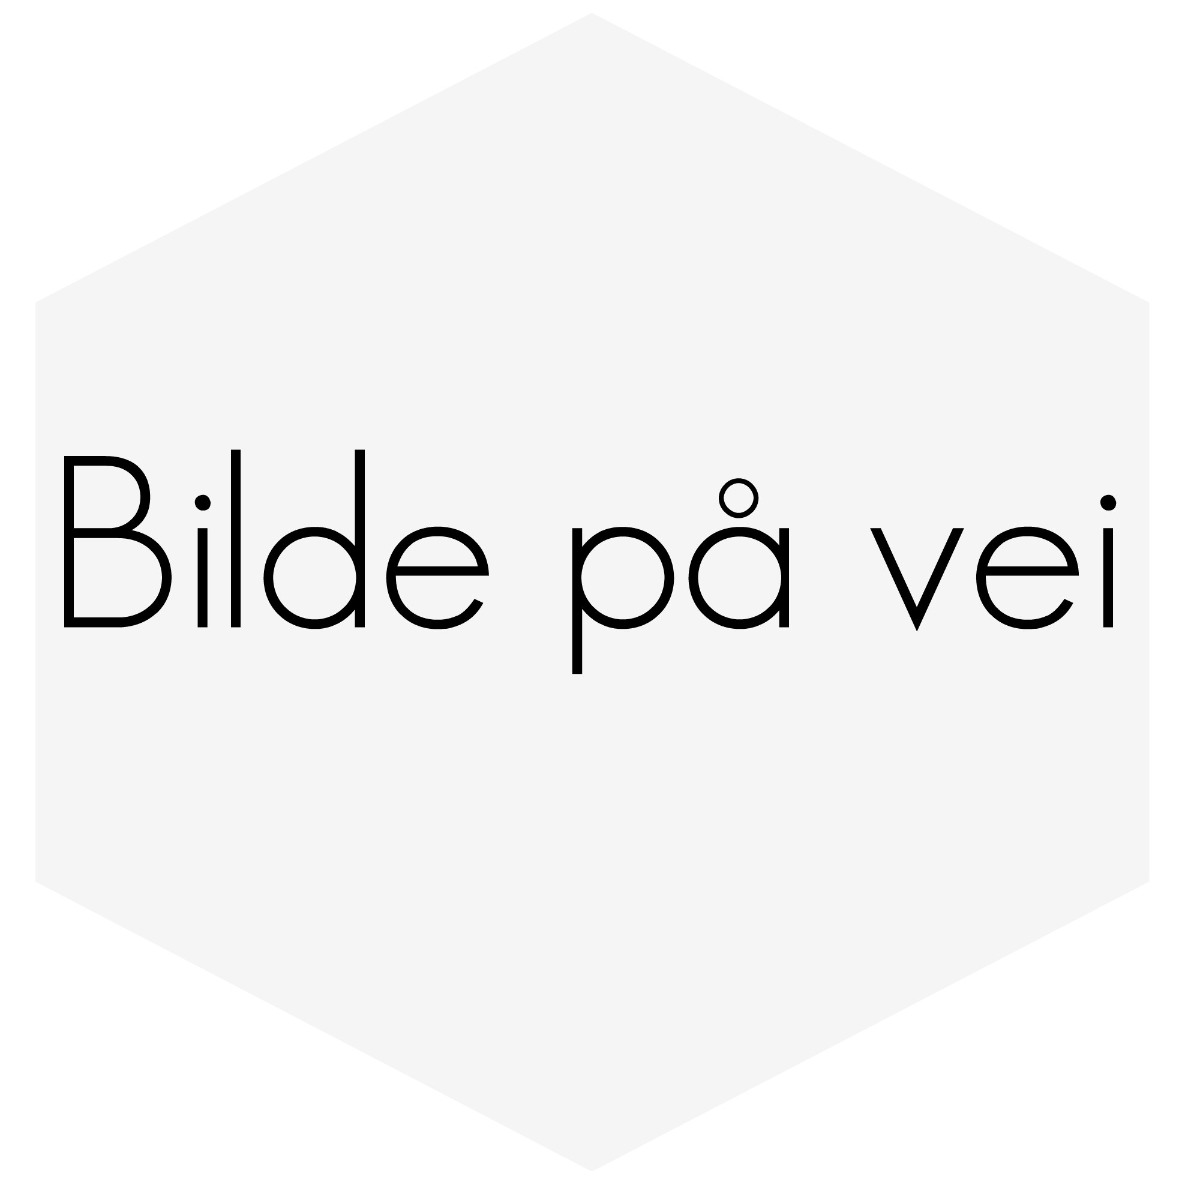 SPENNINGSSTABLISATOR PÅ INSTRUMENT 140 OG 240 VDO